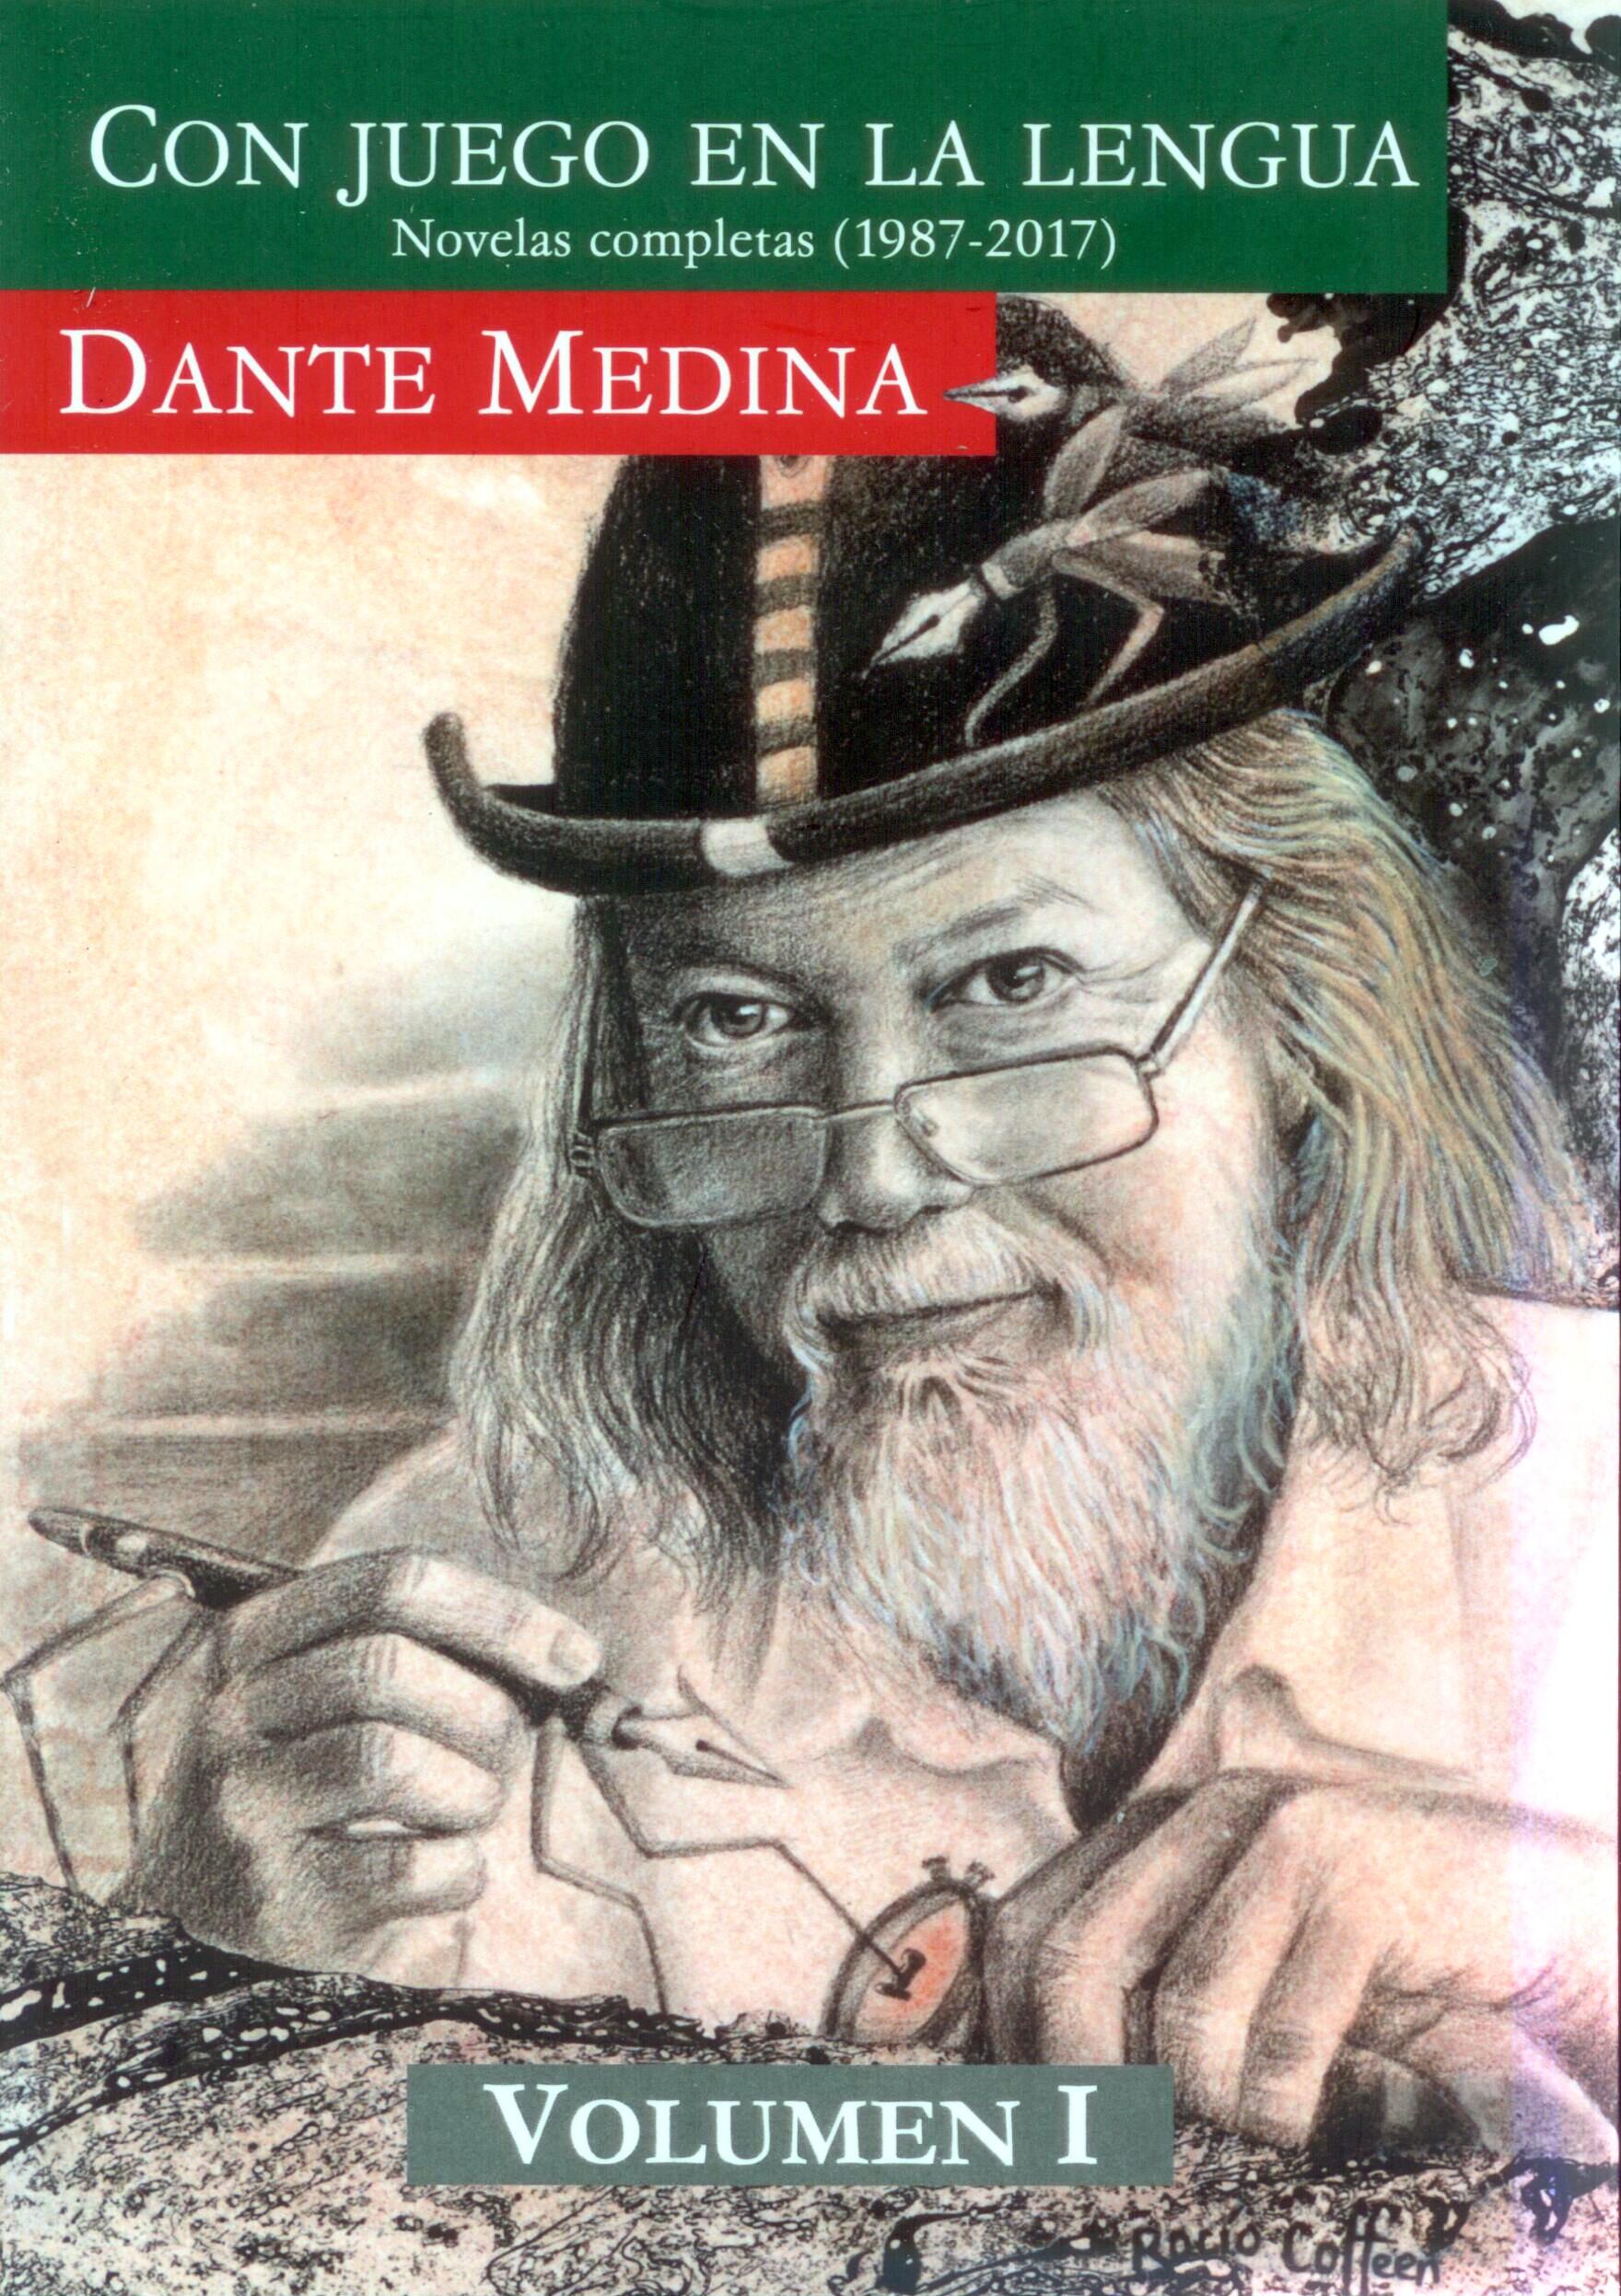 Obra completa Dante Medina